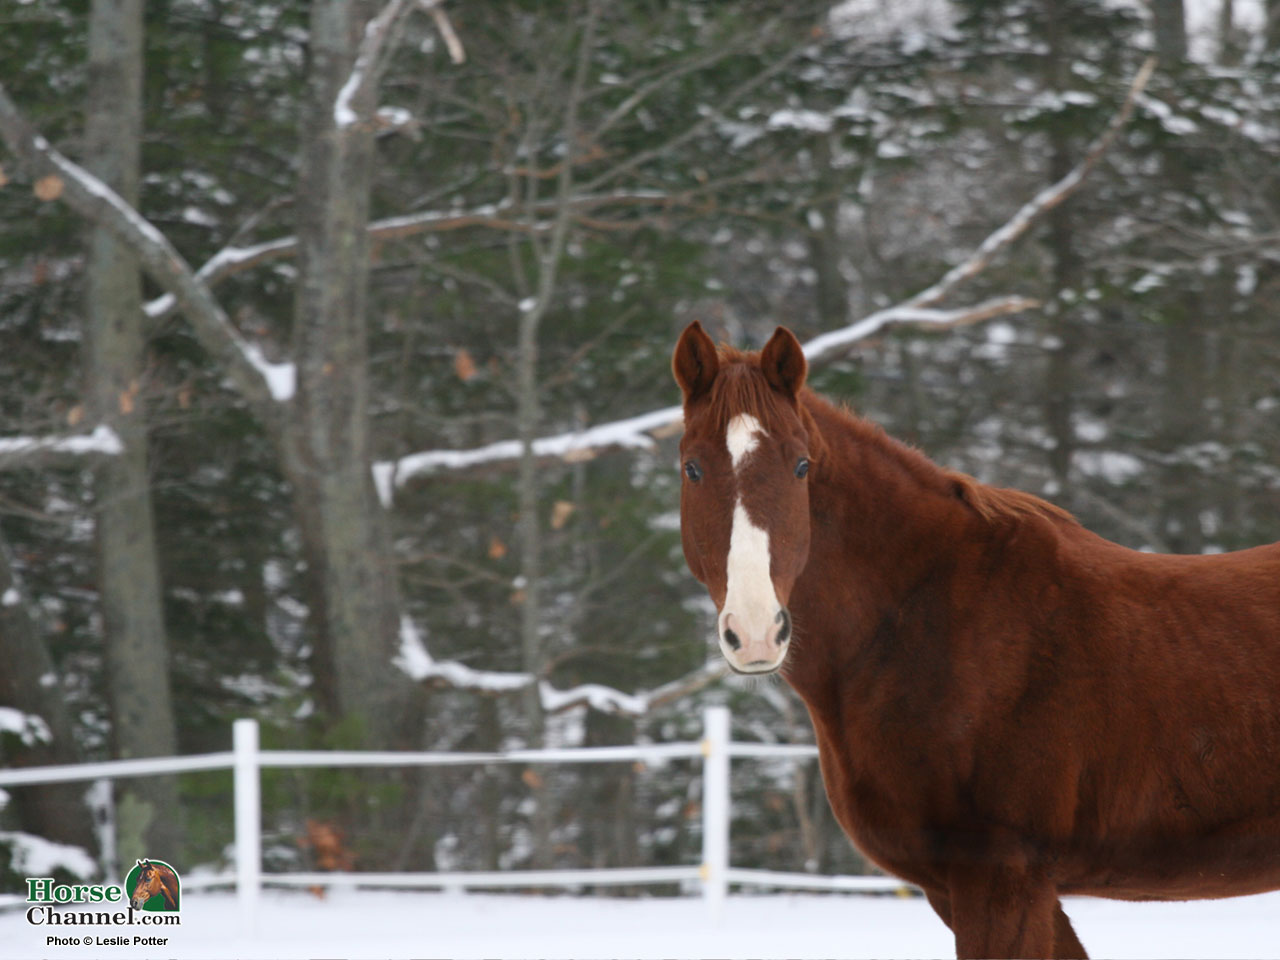 screensaver and desktop wallpapers of winter equine scenery 1280x960